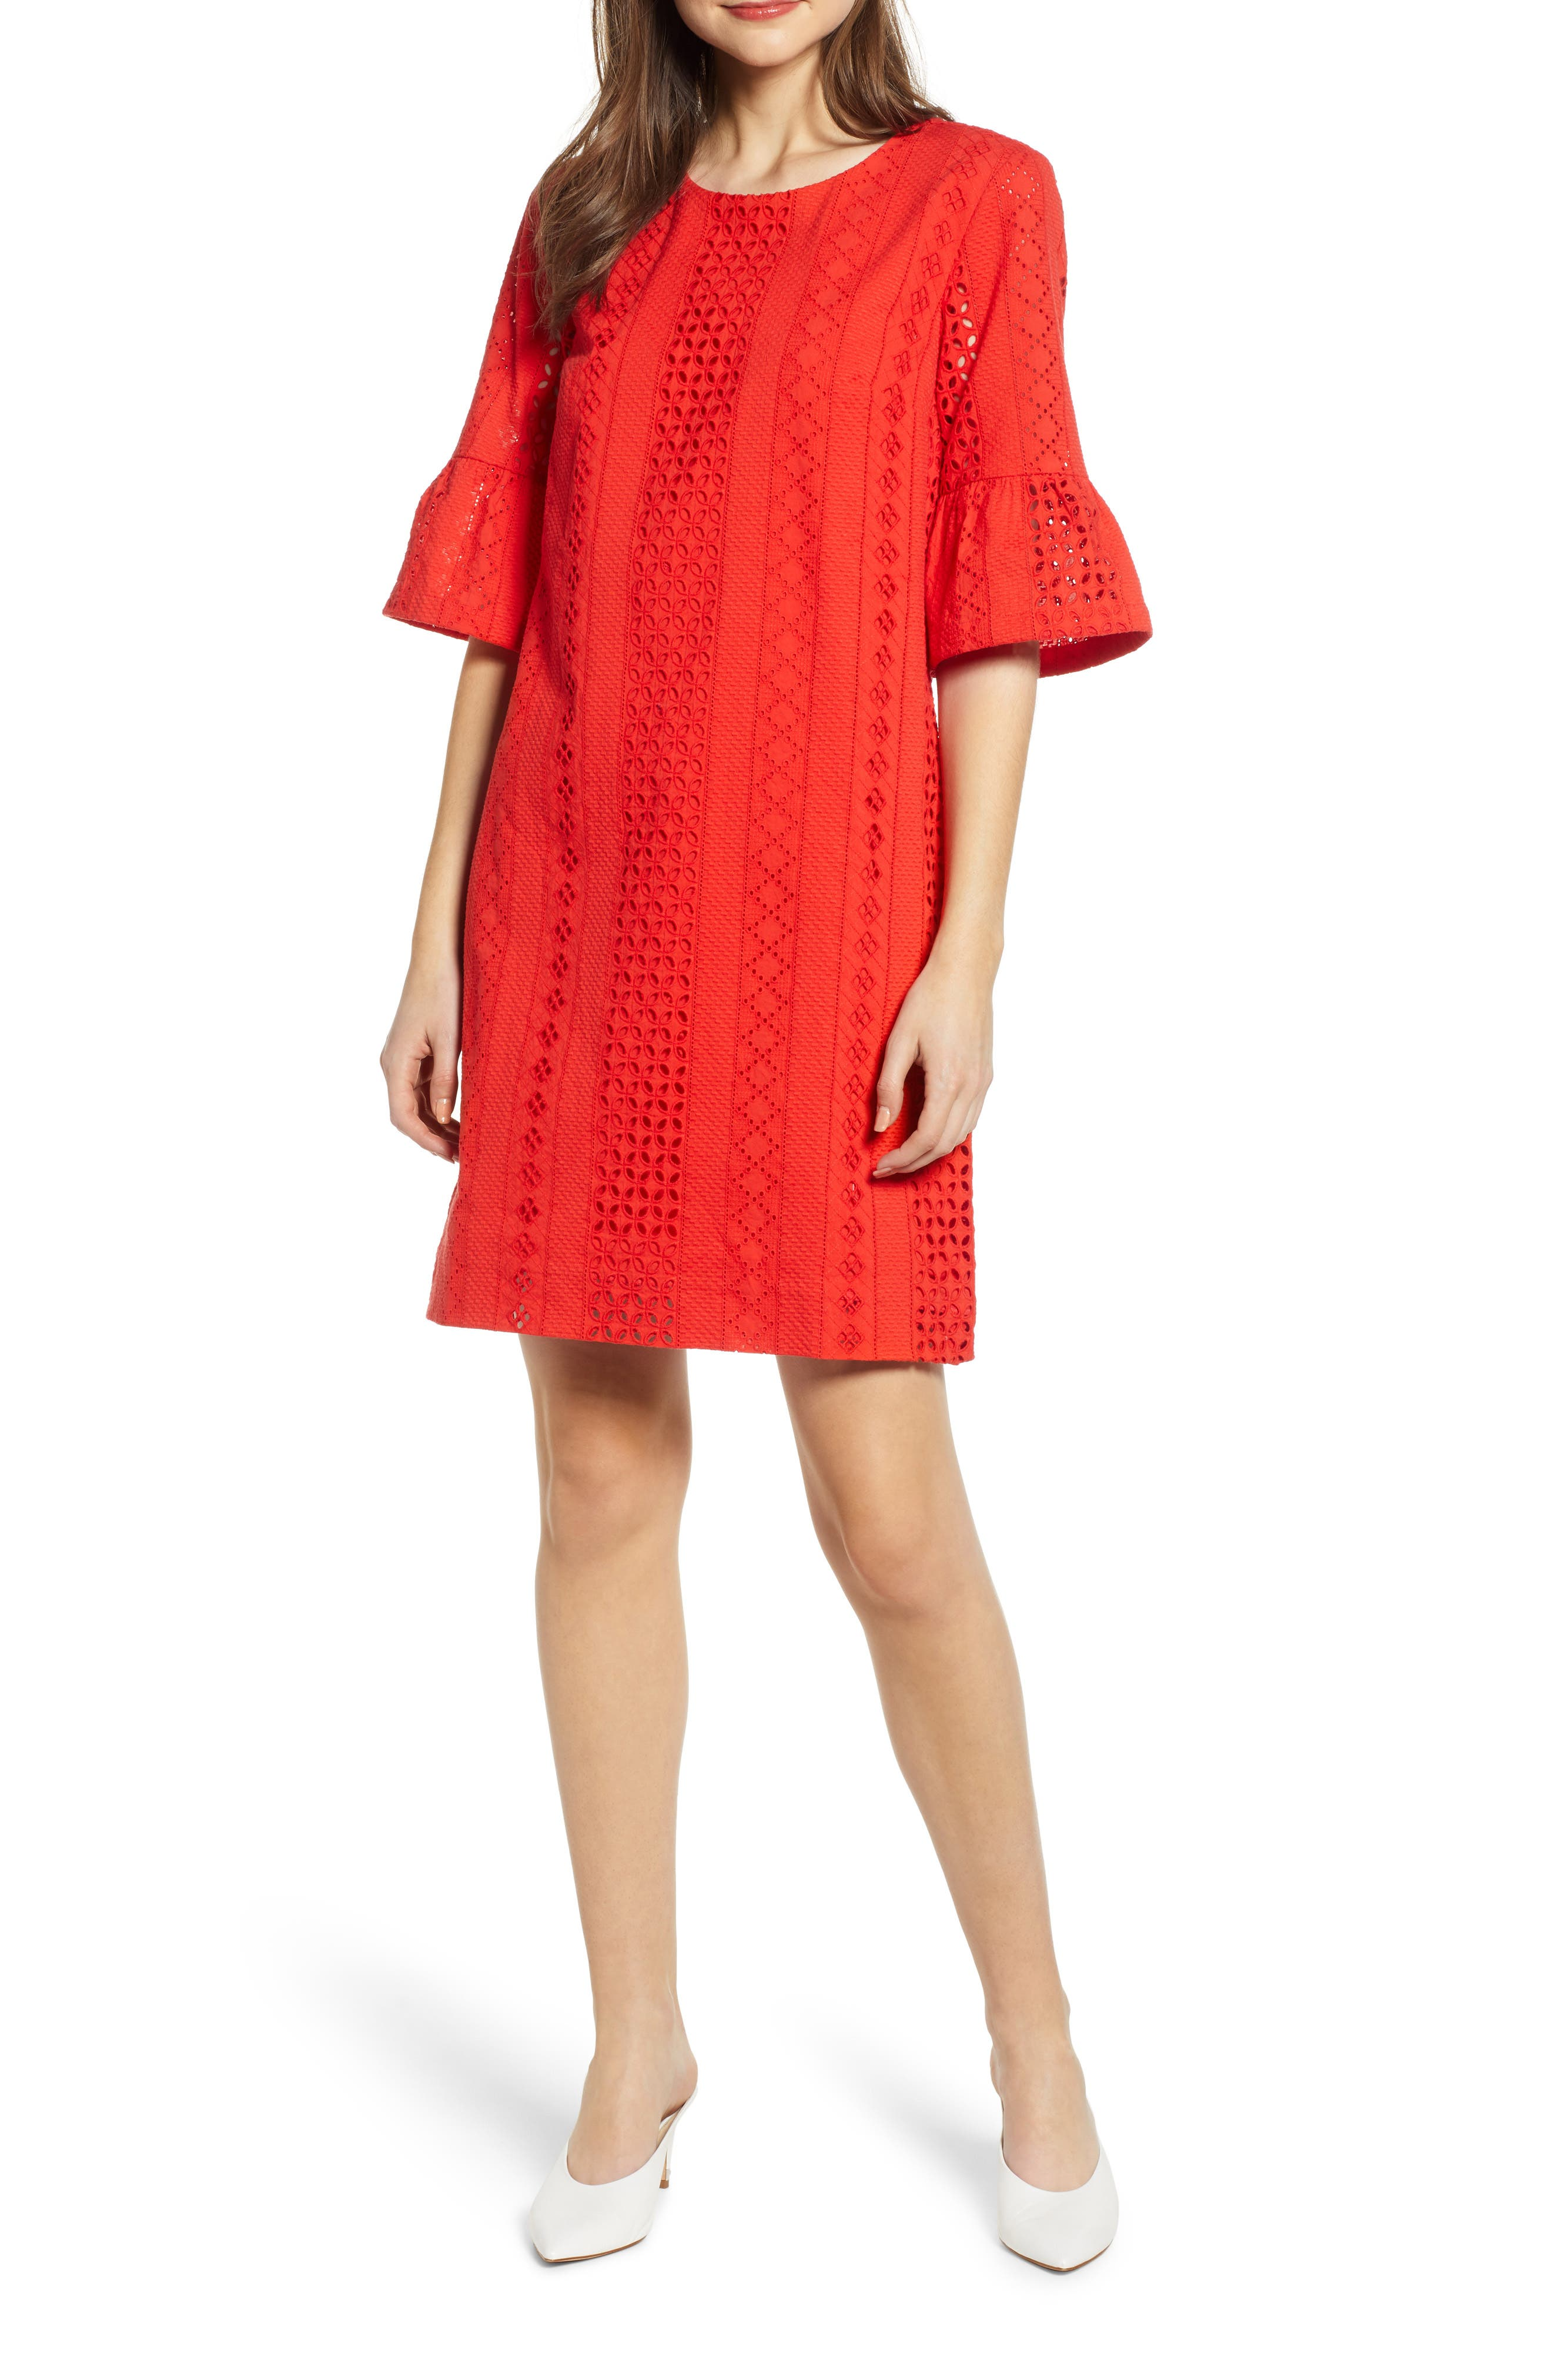 J.crew Flutter Sleeve Eyelet Dress, Red